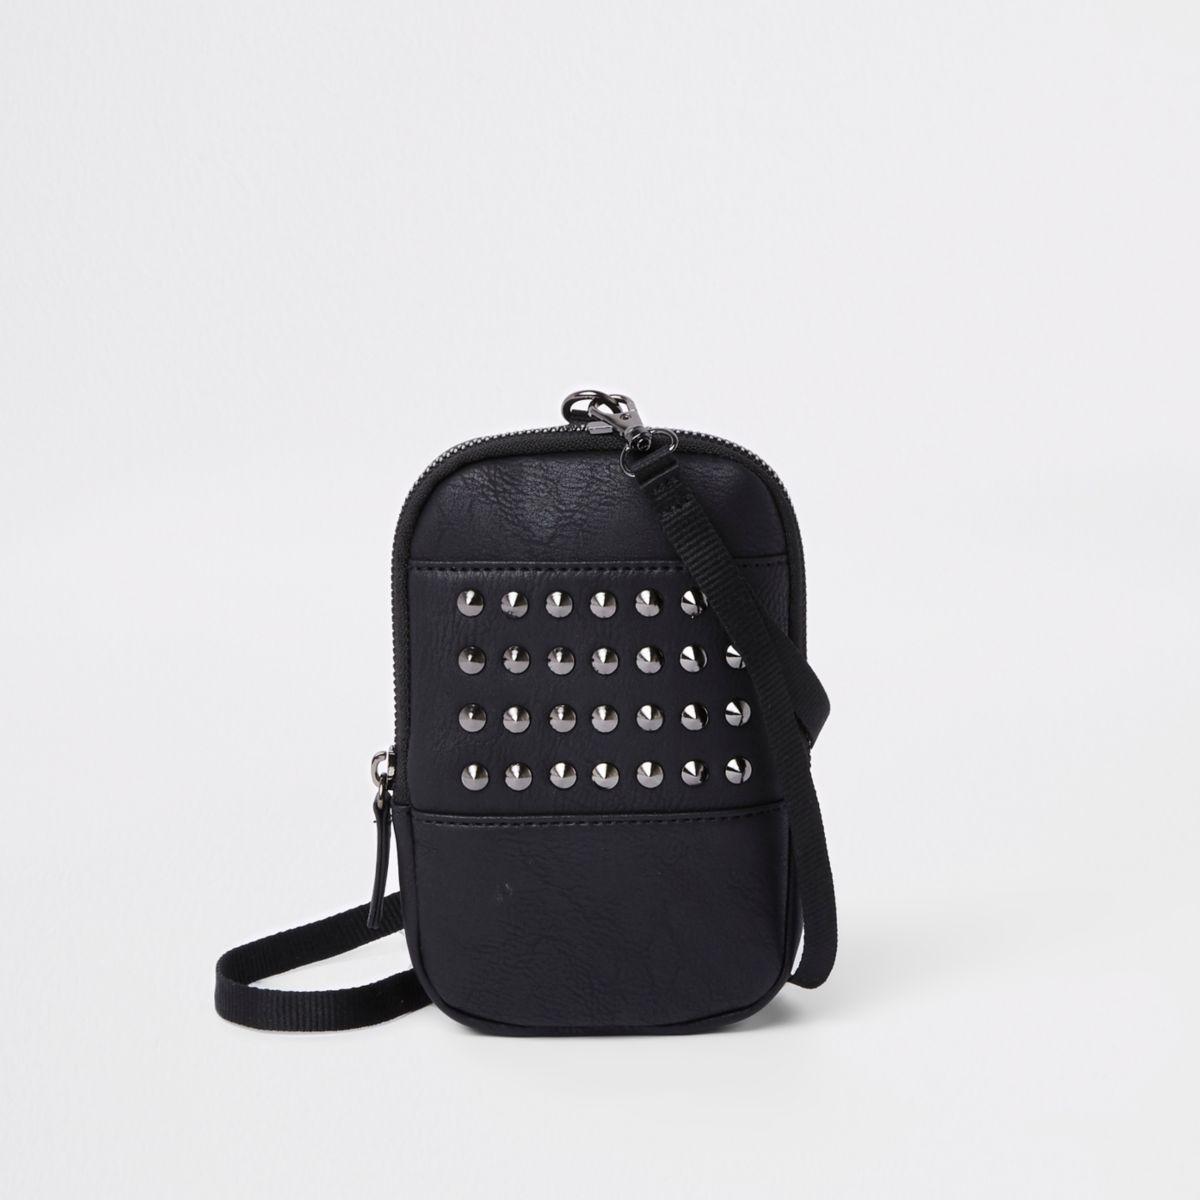 Black stud wallet pouch